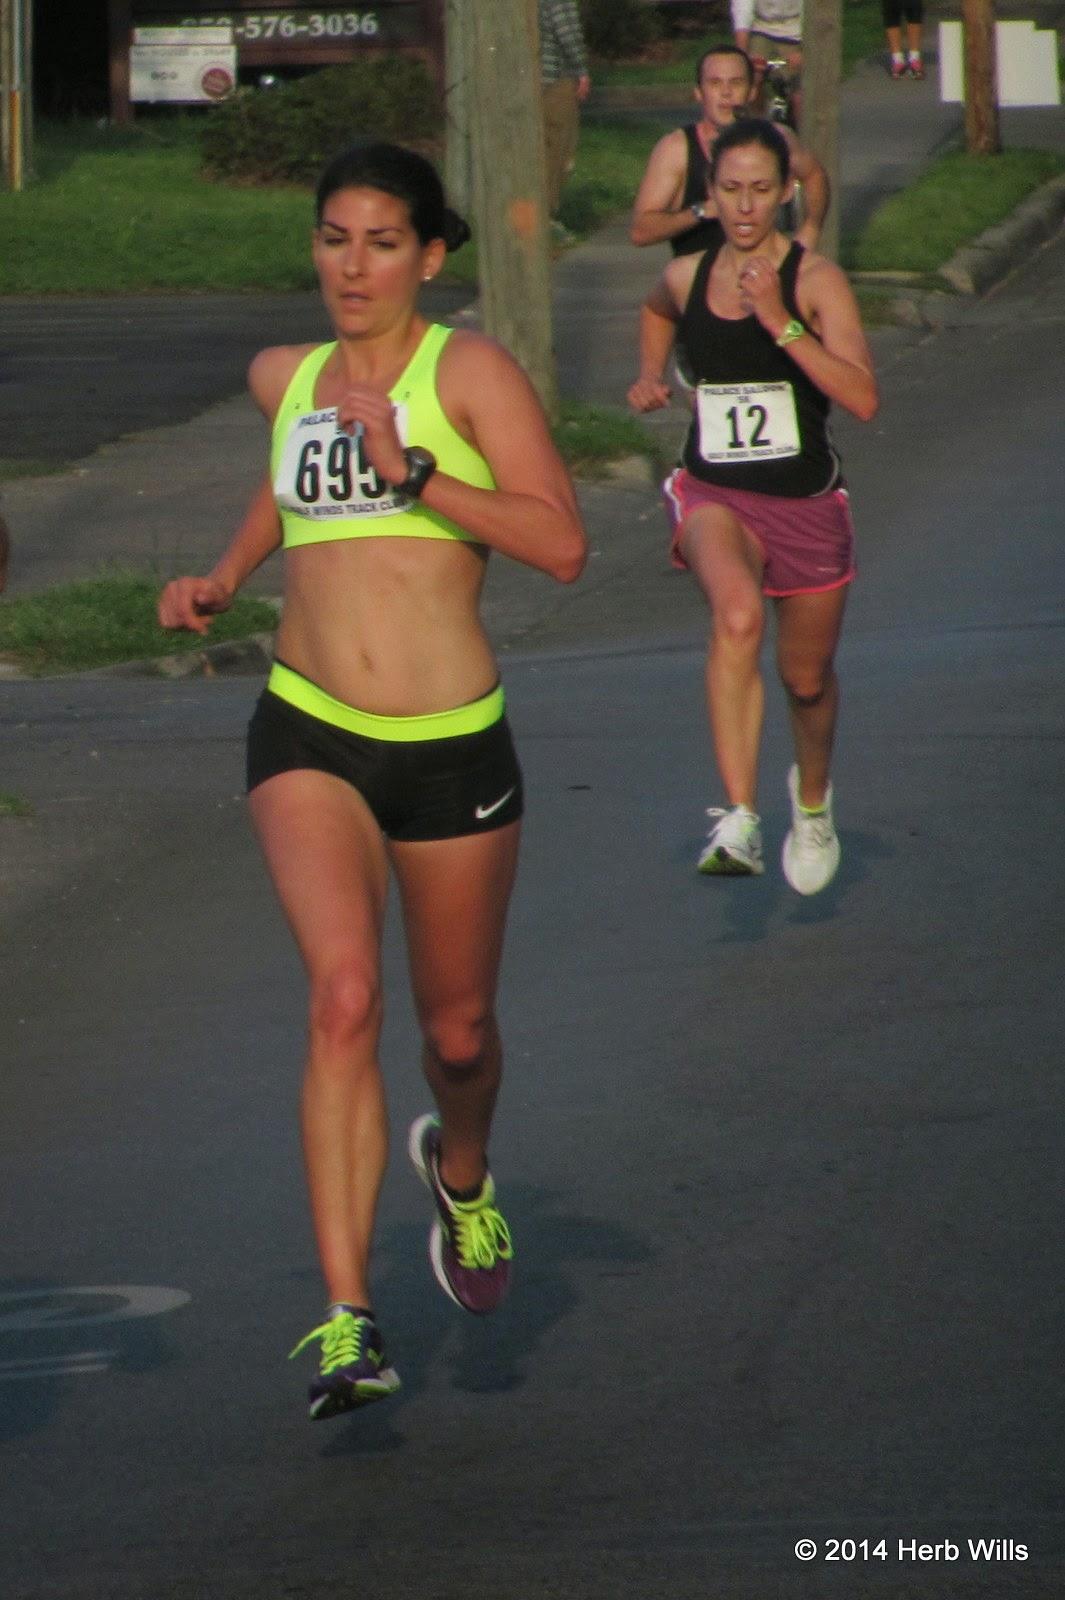 Katie Sherron